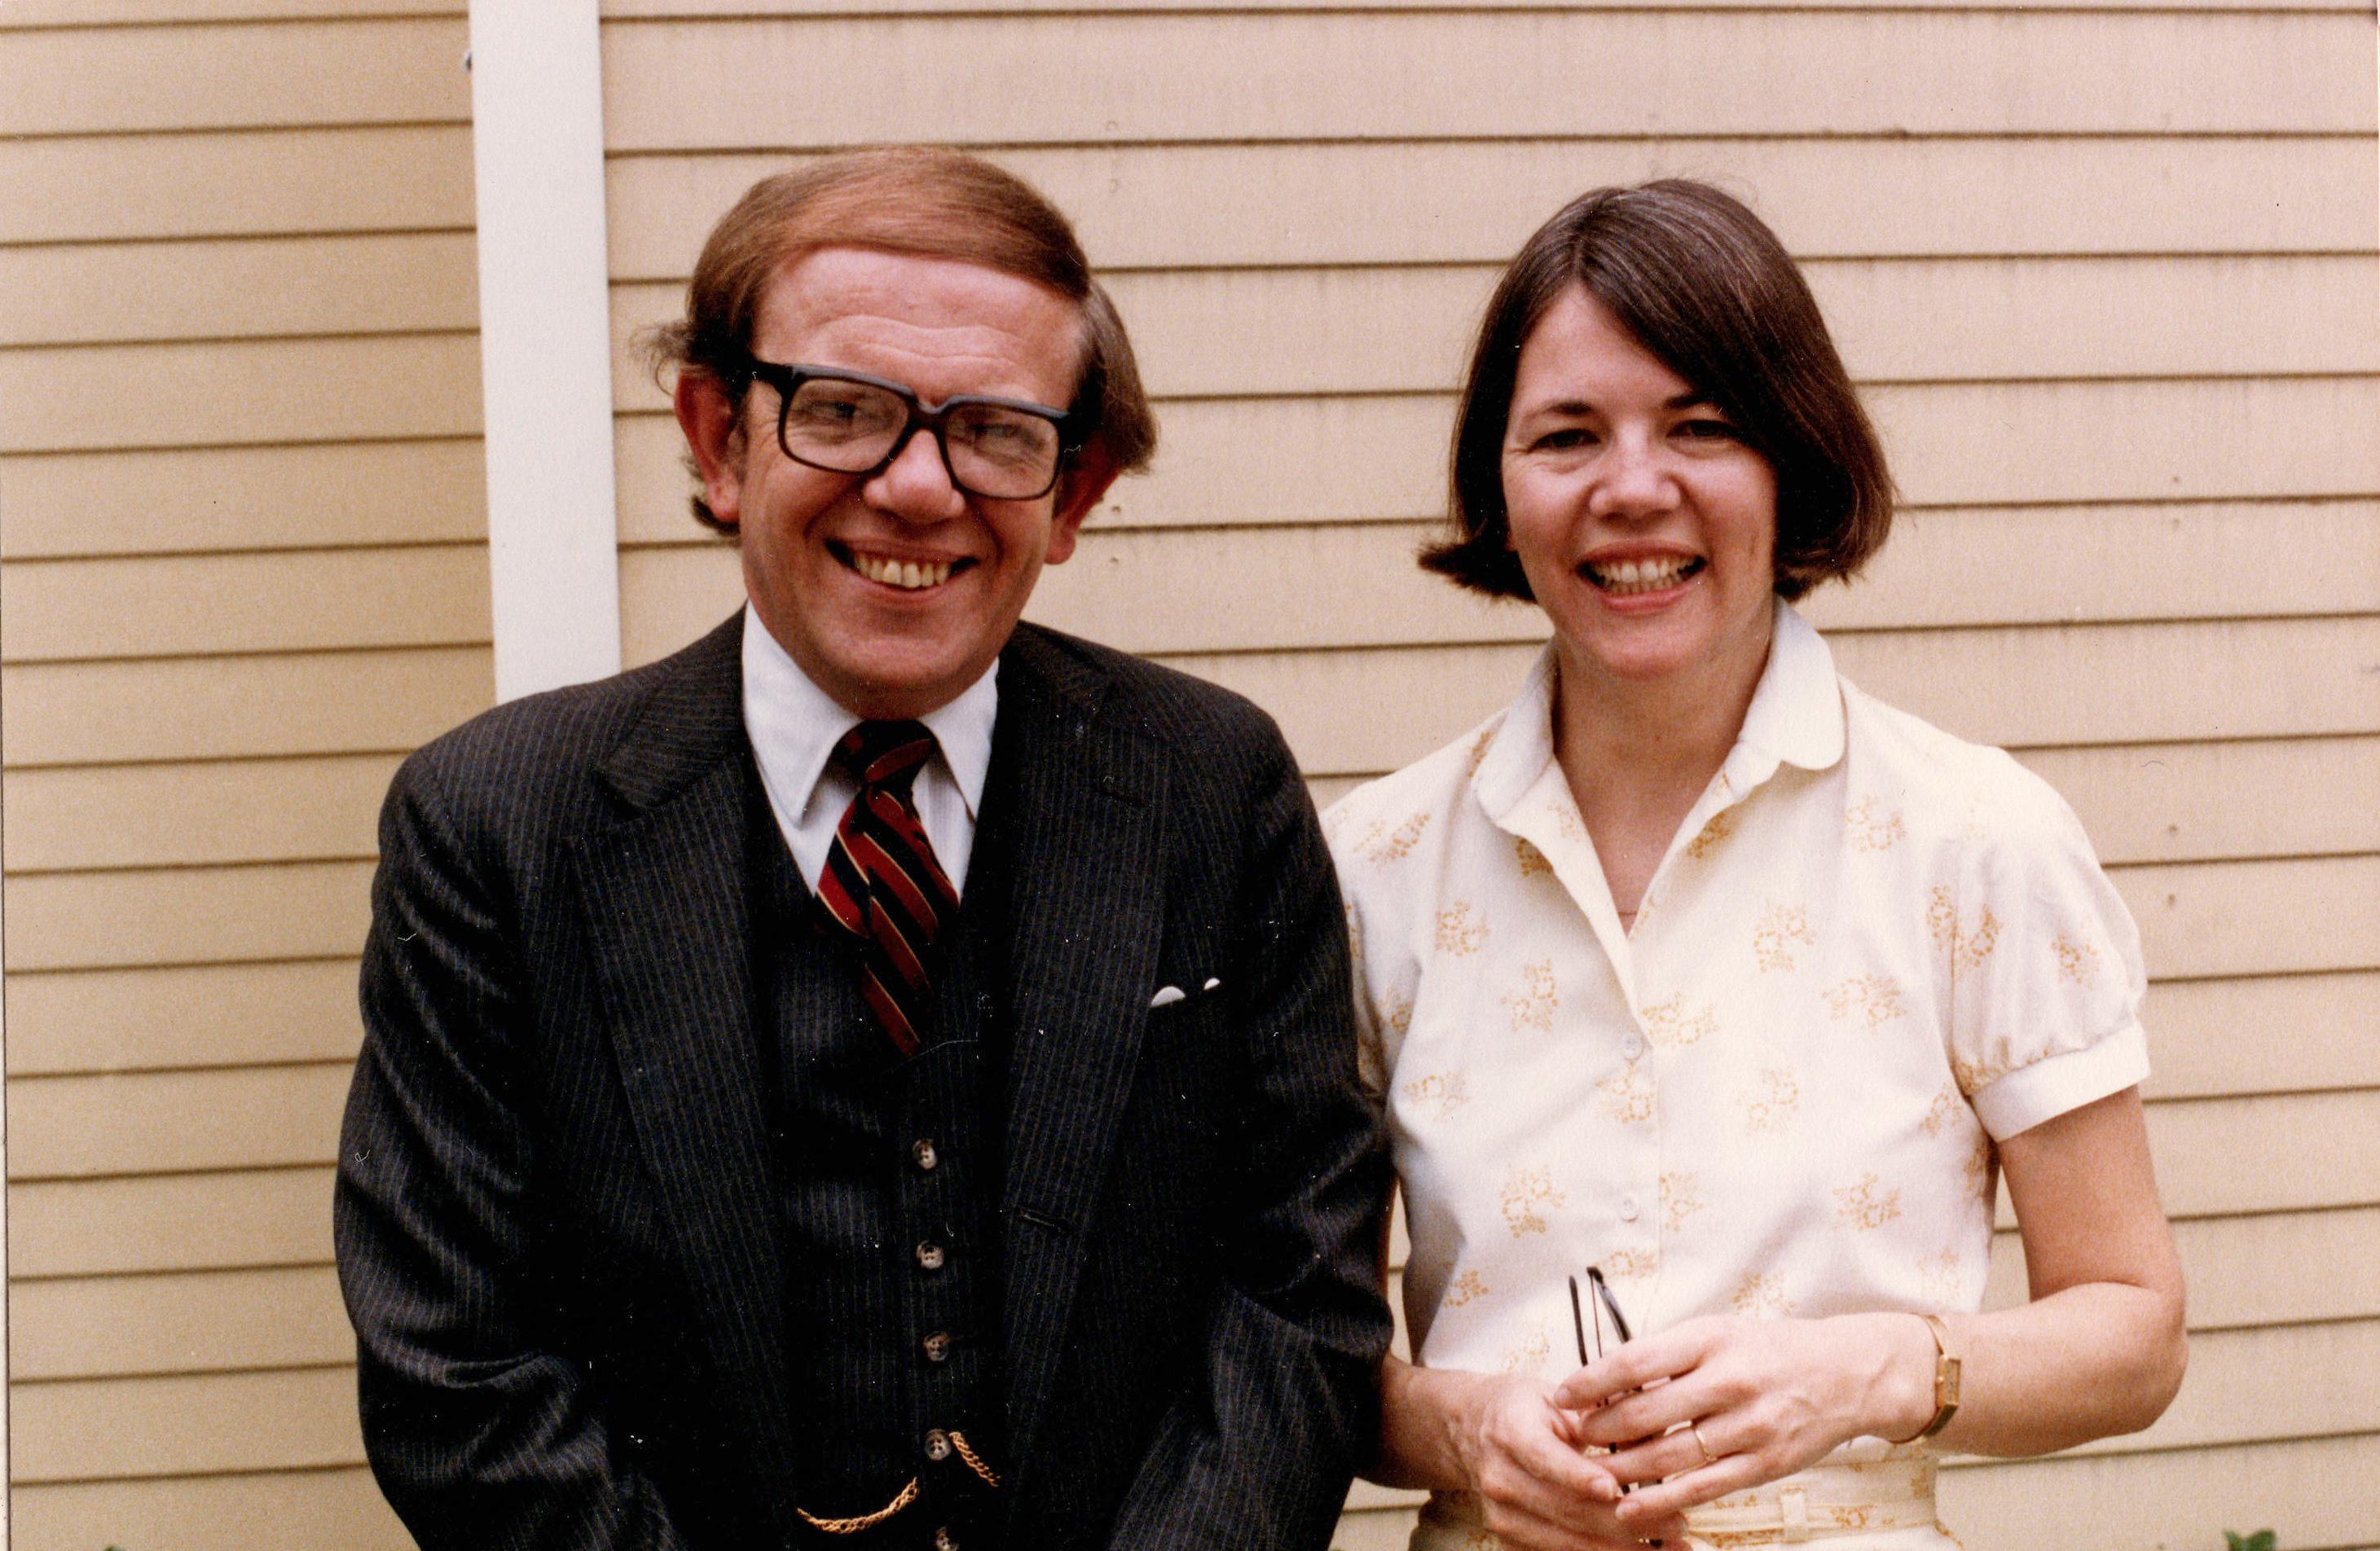 Elizabeth Warren's Journey From 'Pro-Business' Academic To Consumer Advocate